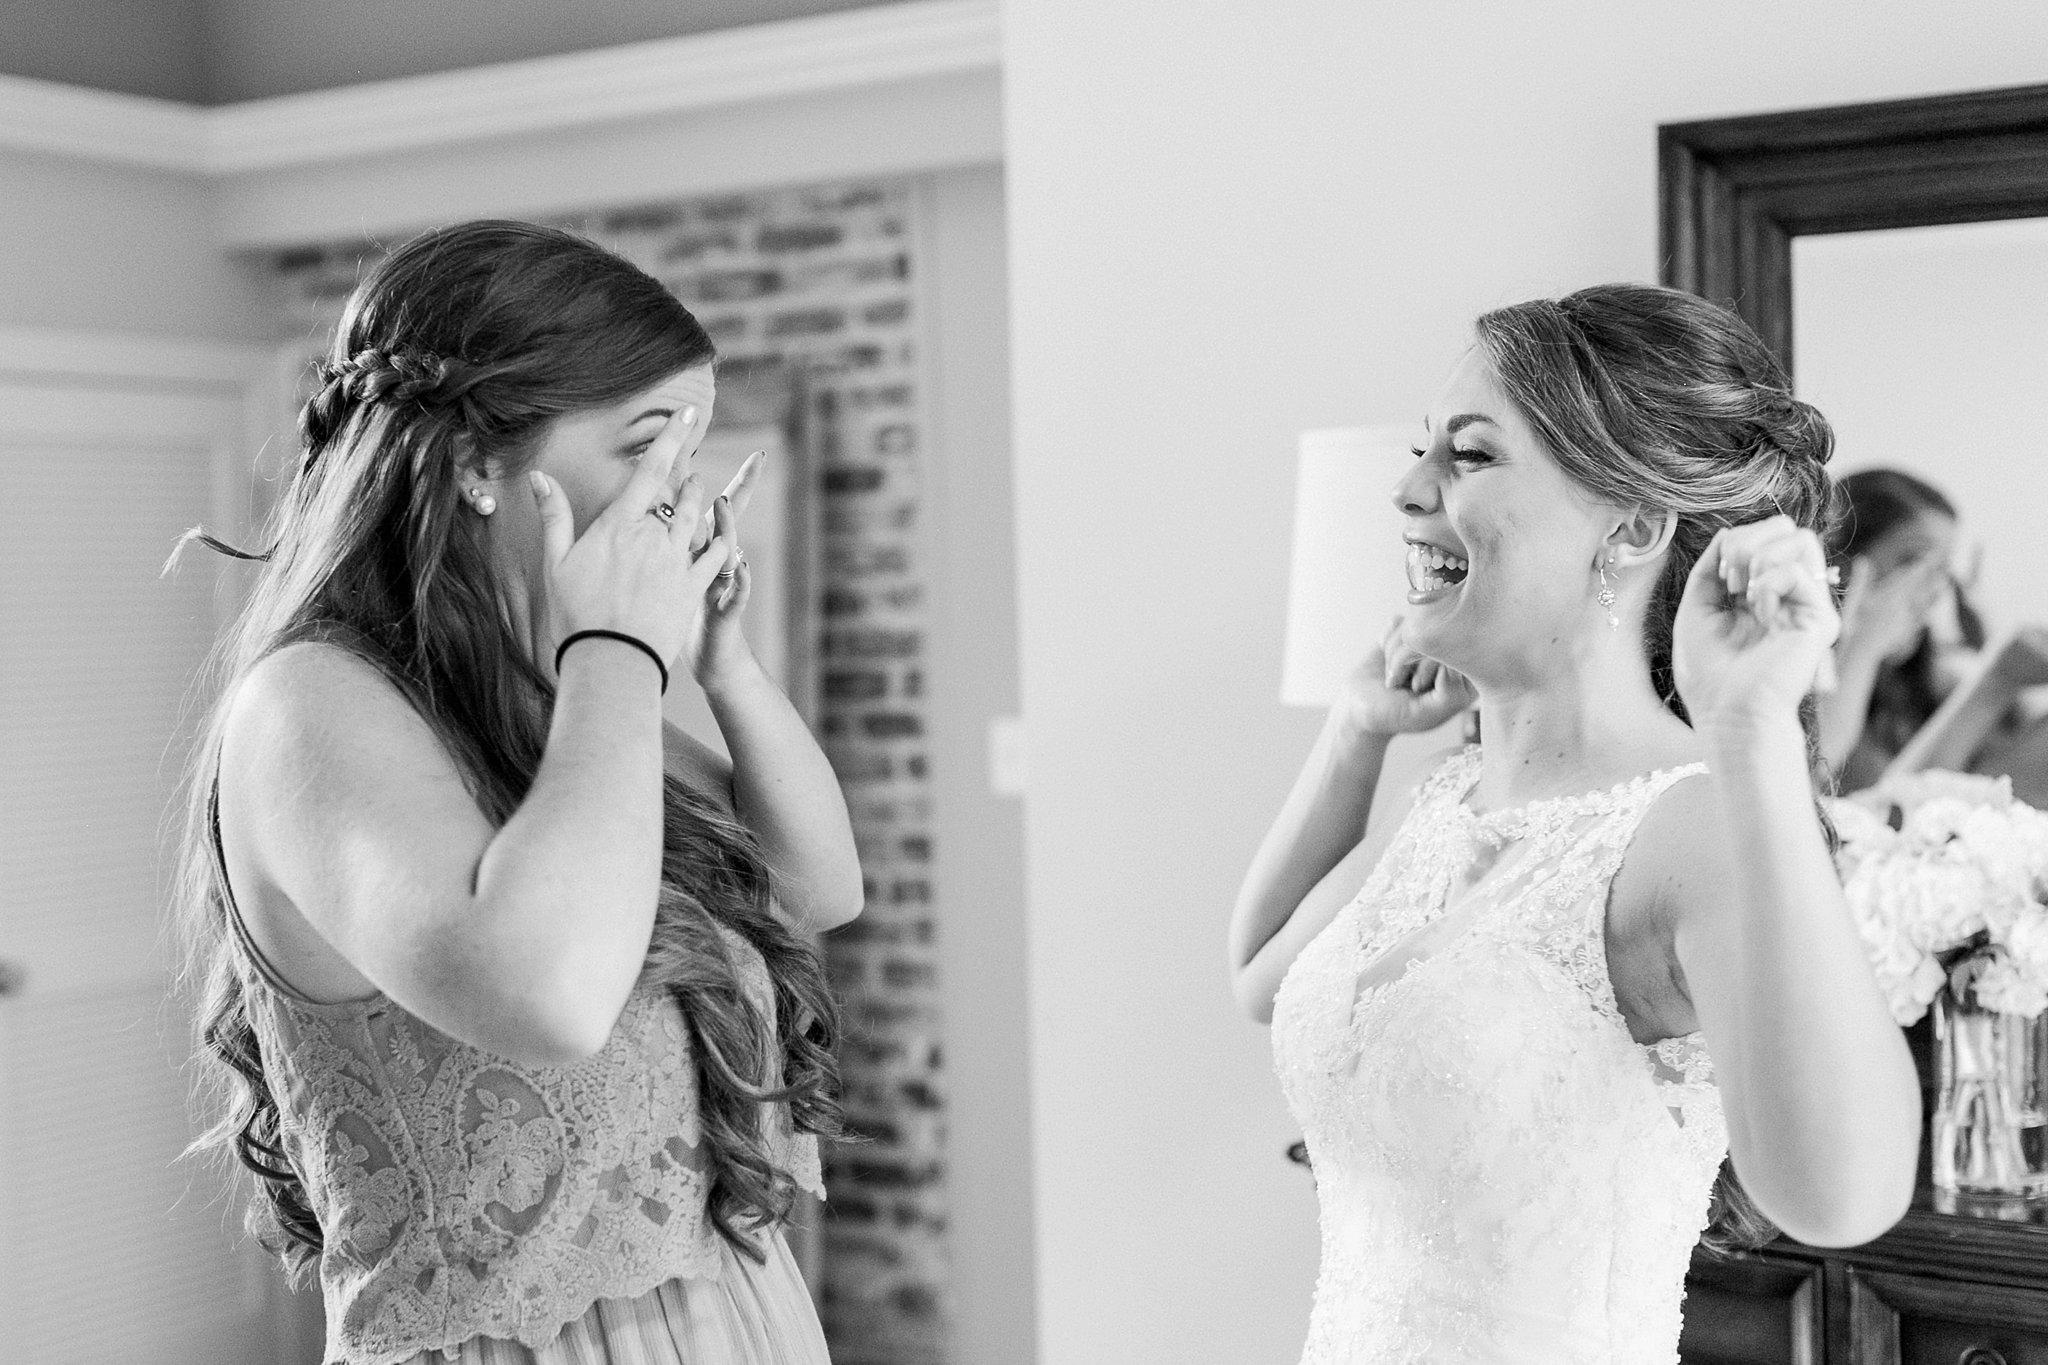 Stone Tower Winery Wedding Photos Virginia Wedding Photographer Megan Kelsey Photography Sam & Angela-48.jpg